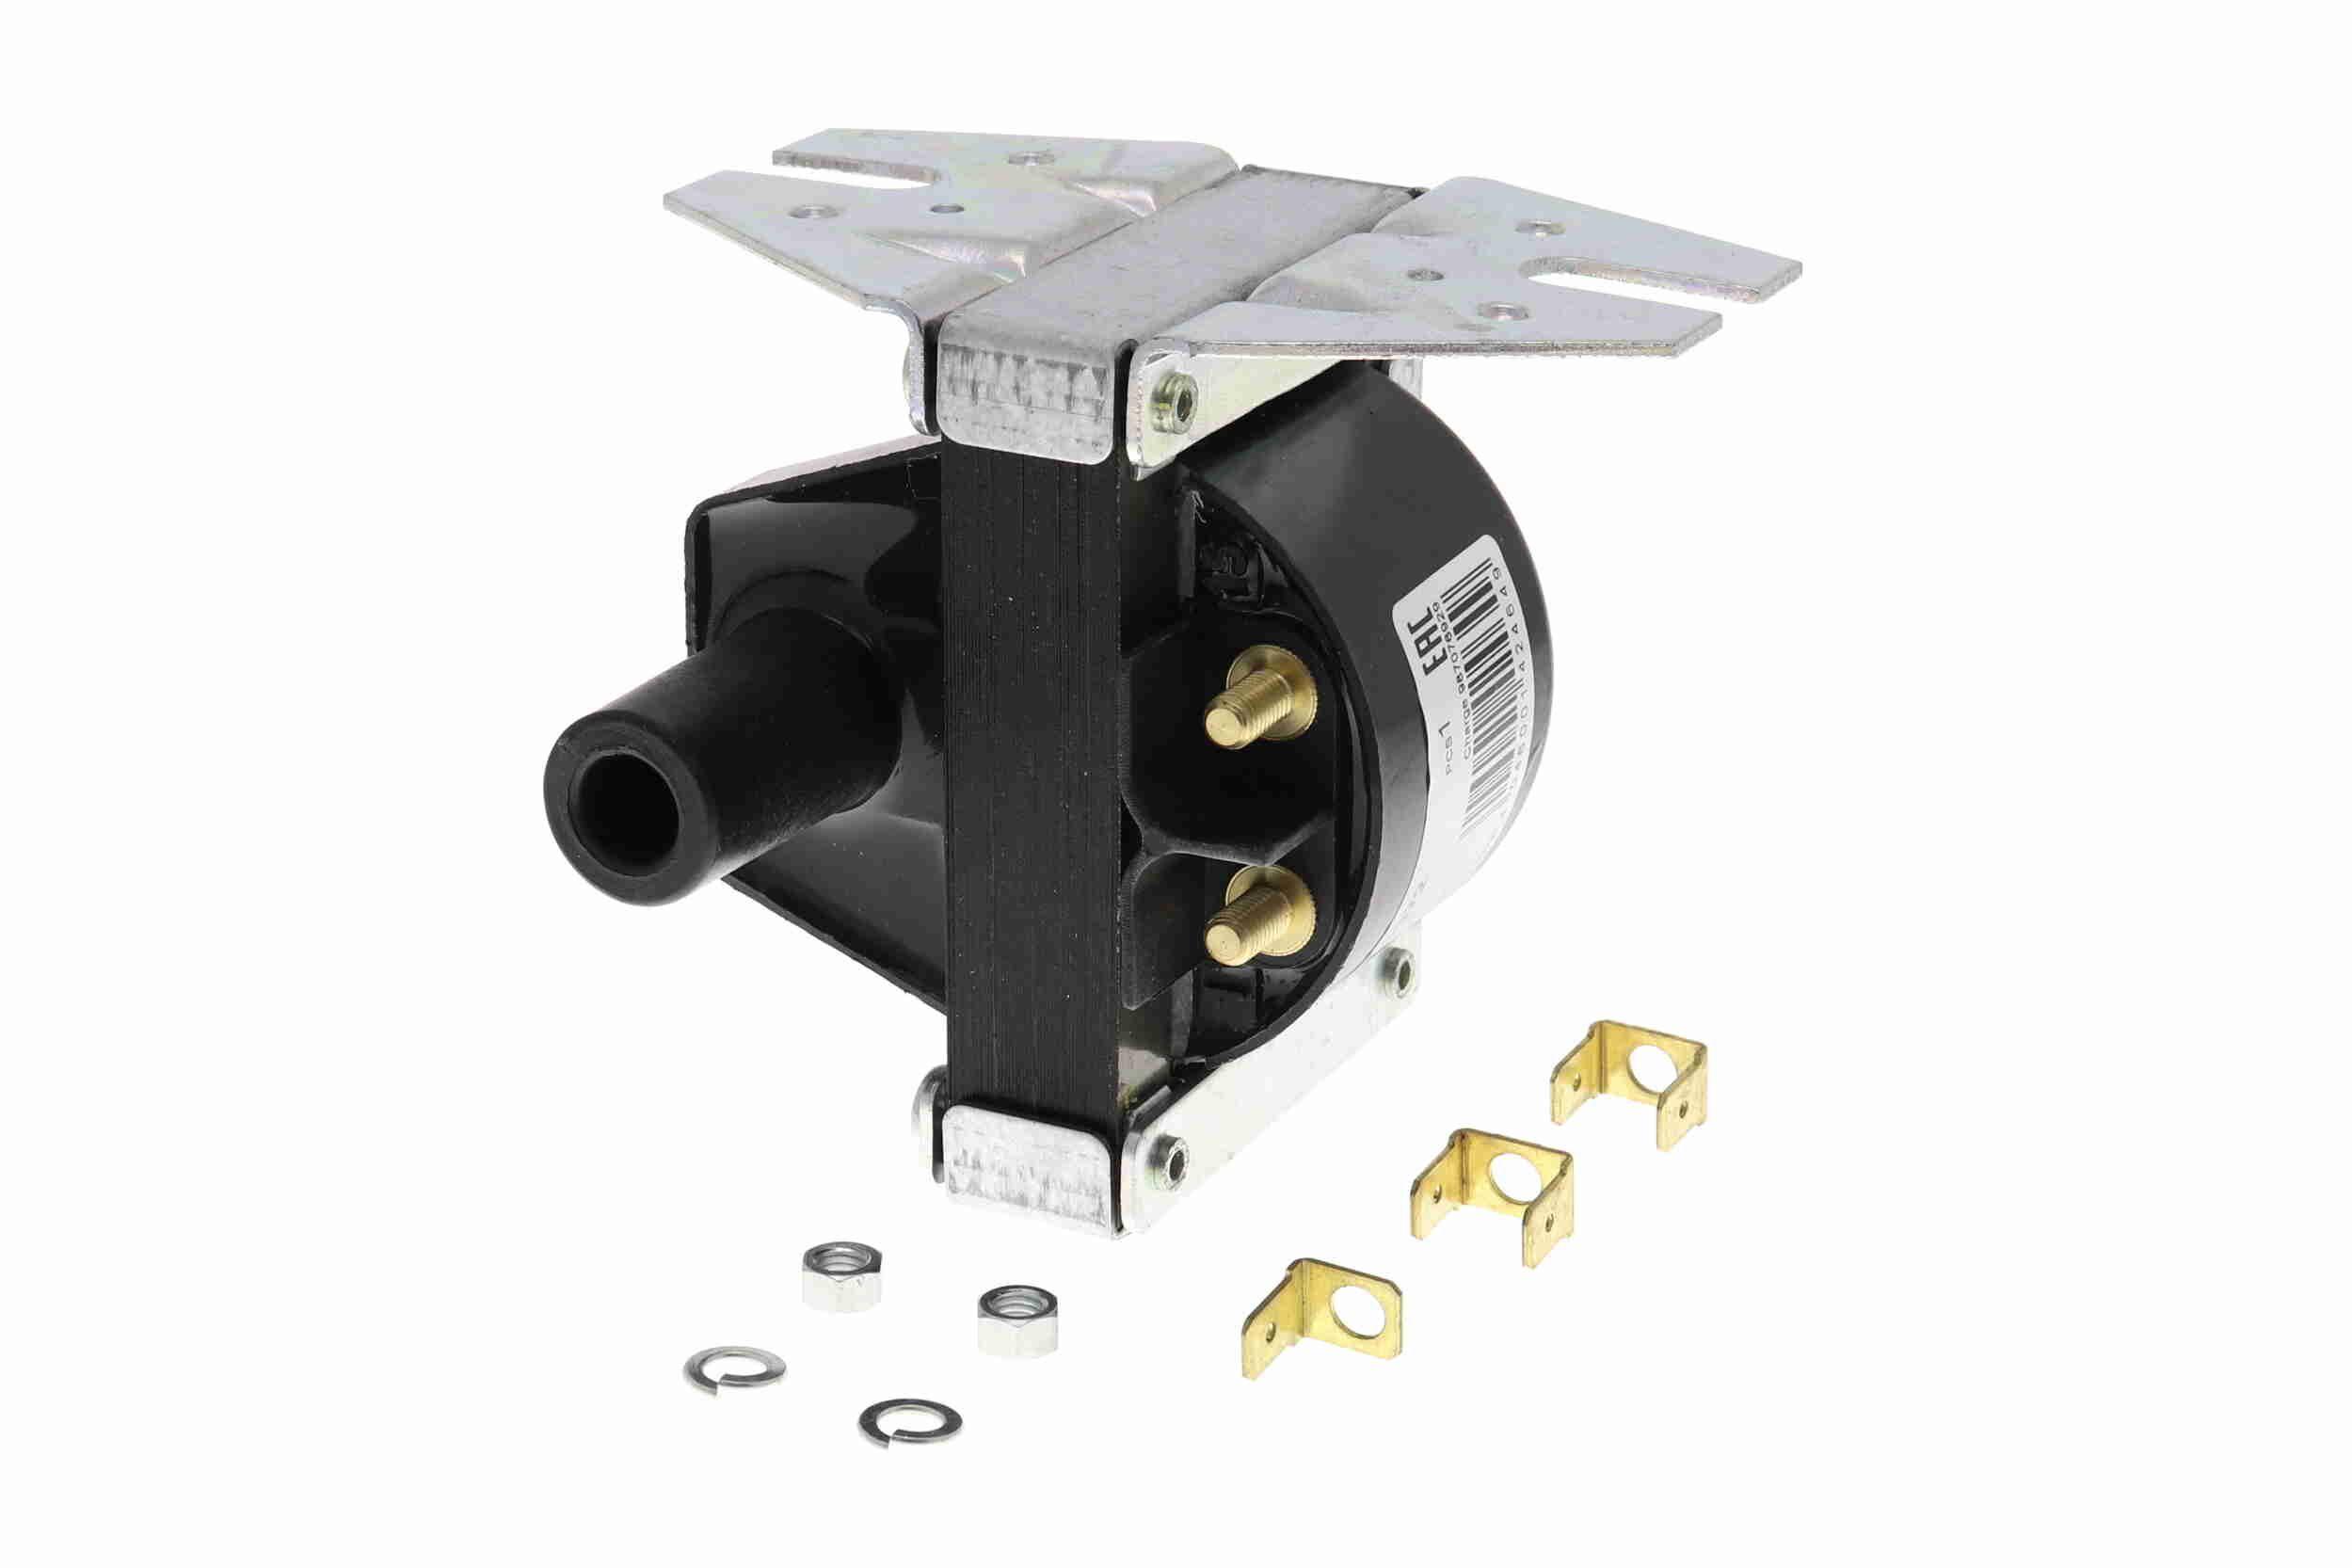 Zündspule V10-70-0072 VEMO V10-70-0072 in Original Qualität